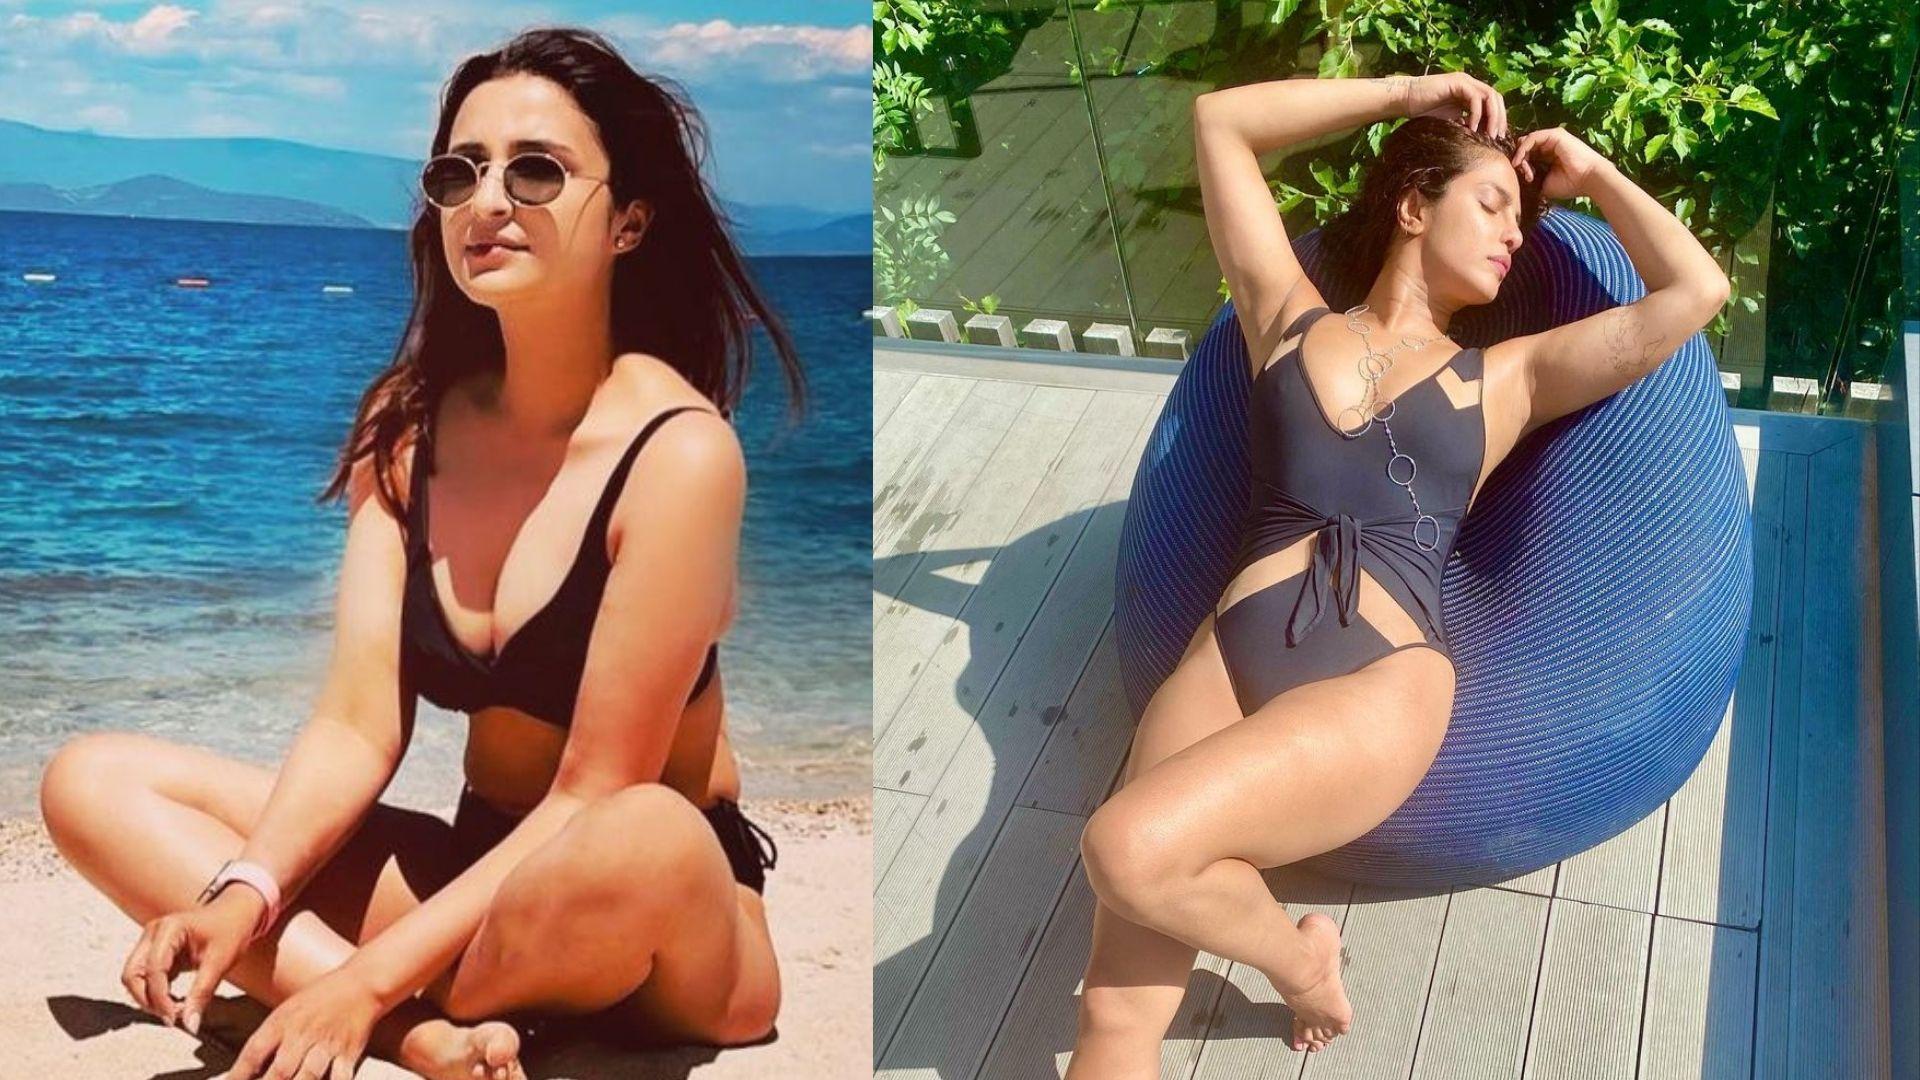 Did Parineeti Chopra Copy Priyanka Chopra's Sizzling Bikini Pose? Quantico Actress Asks Sister, 'Inspired?'